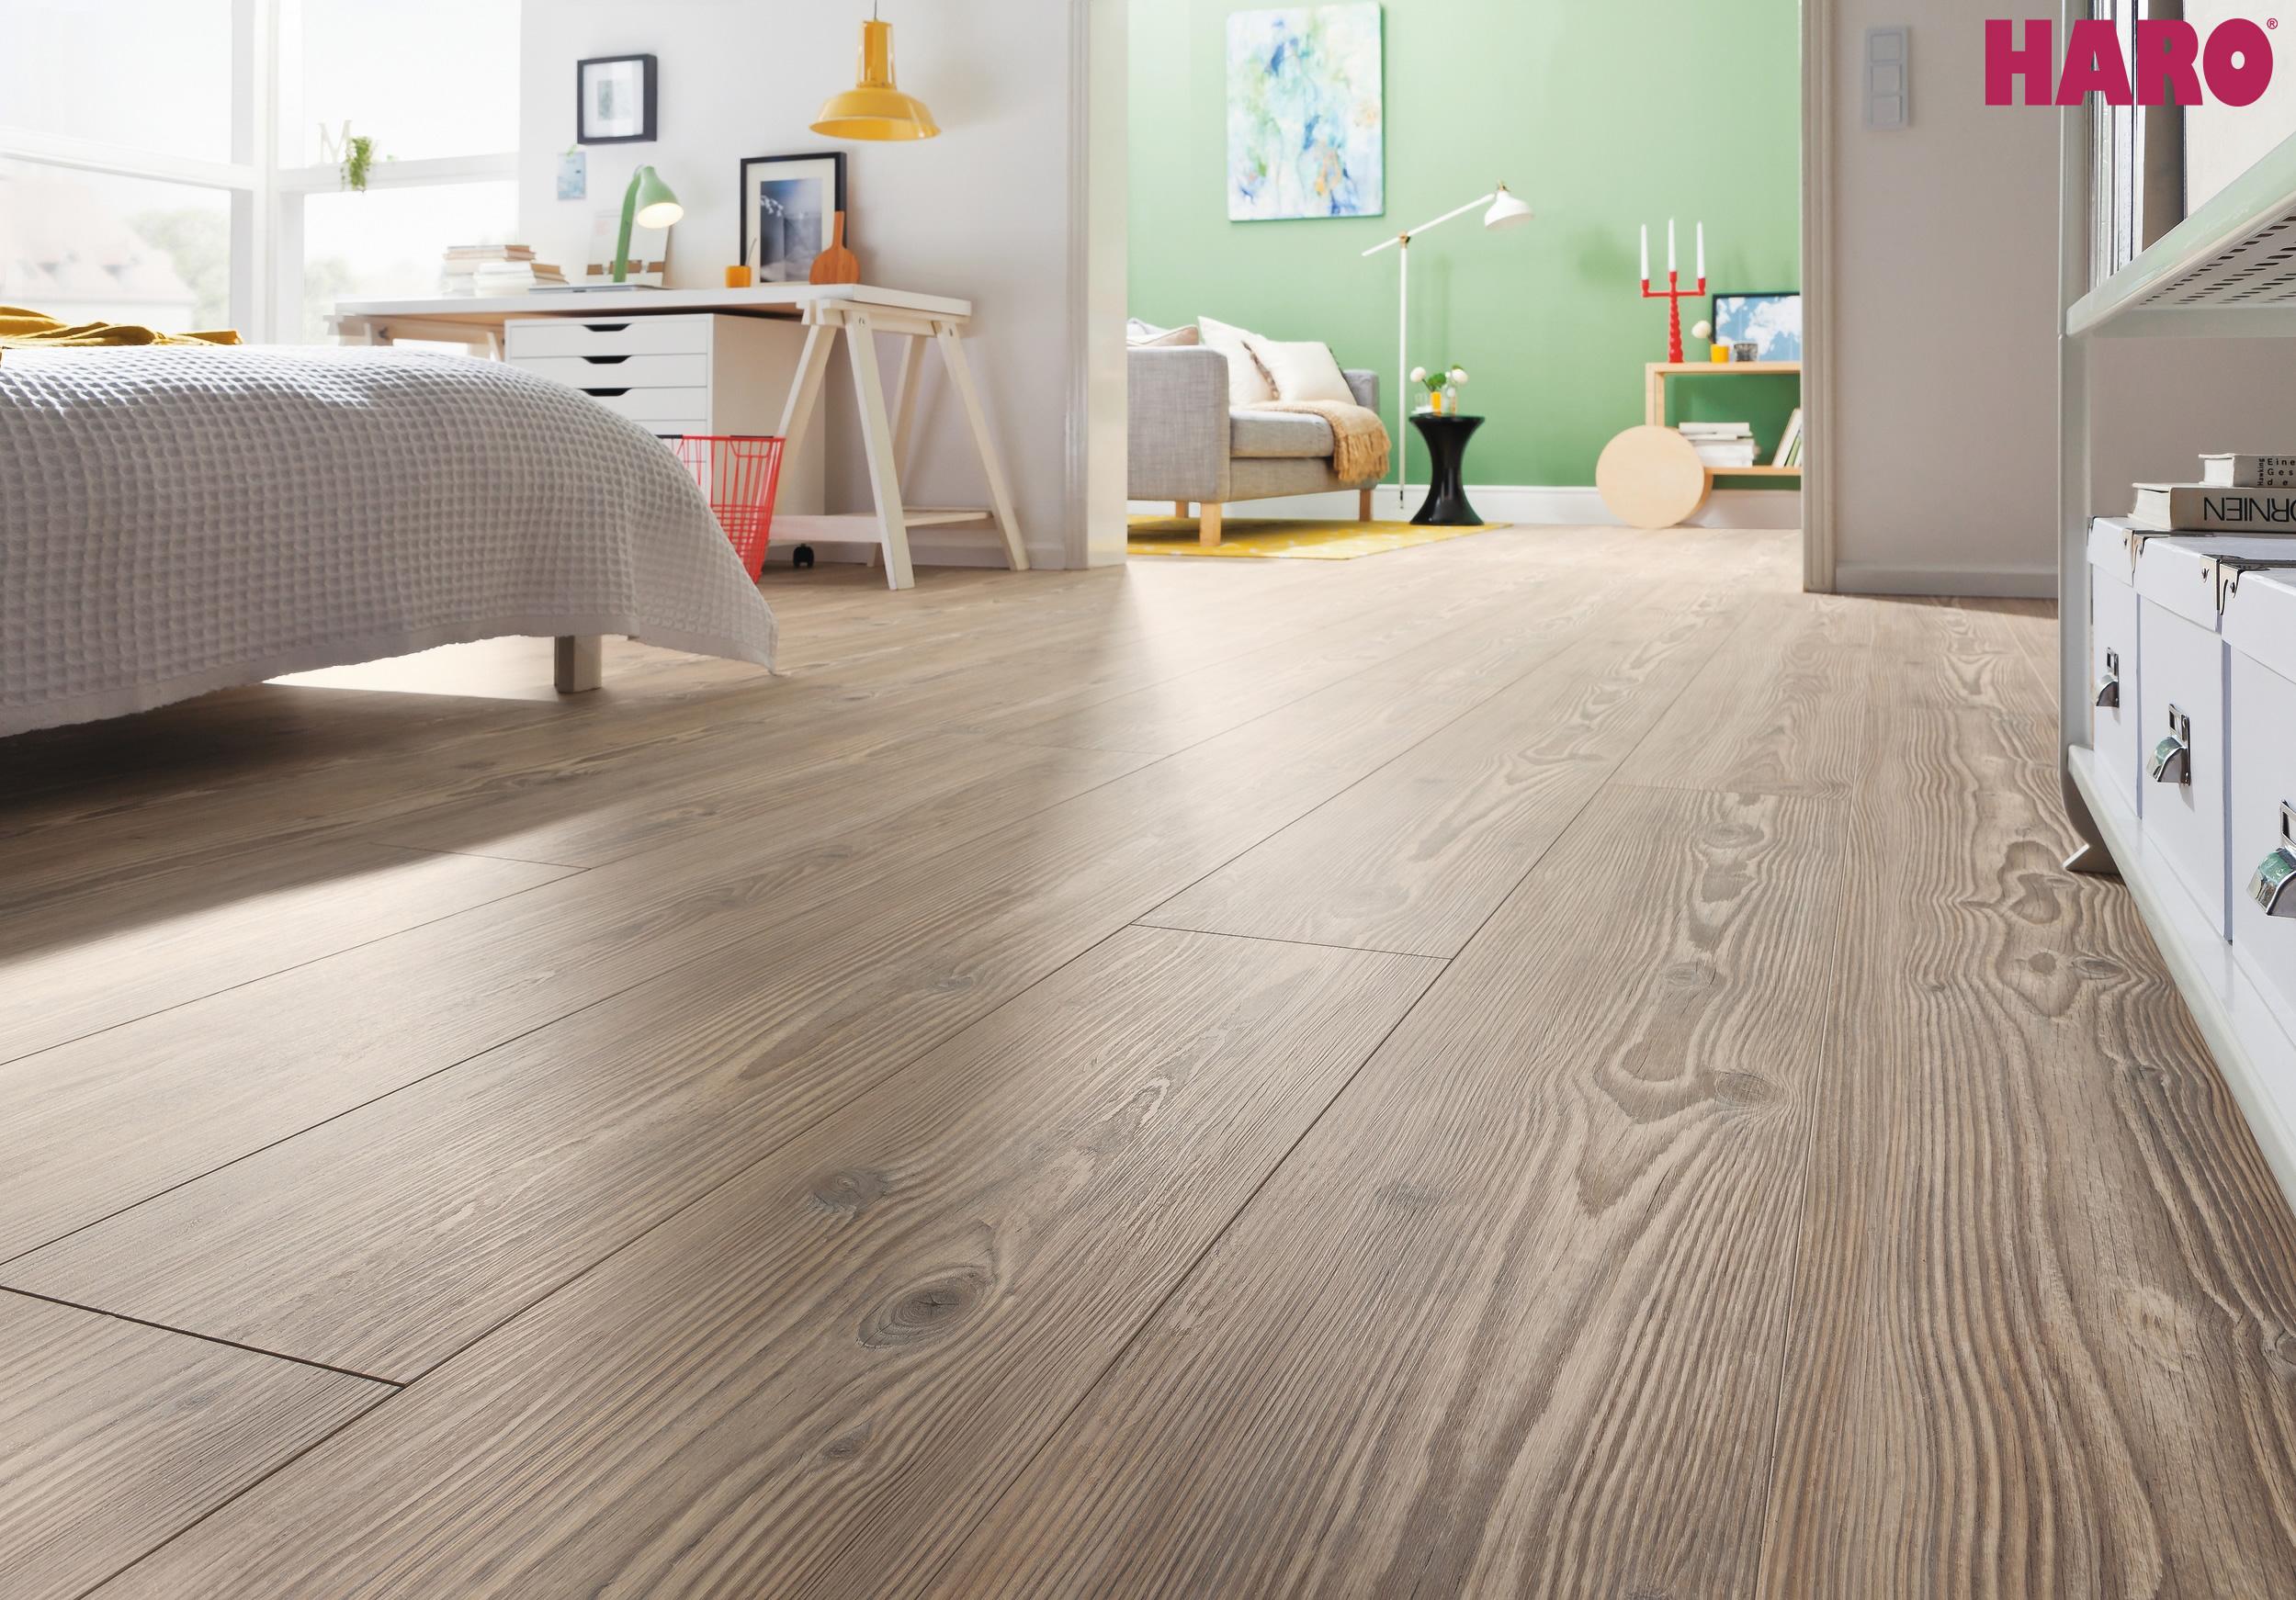 529908 disano classic by haro designboden pinie tessin xl landhausdiele strukturiert mit 4v fase. Black Bedroom Furniture Sets. Home Design Ideas